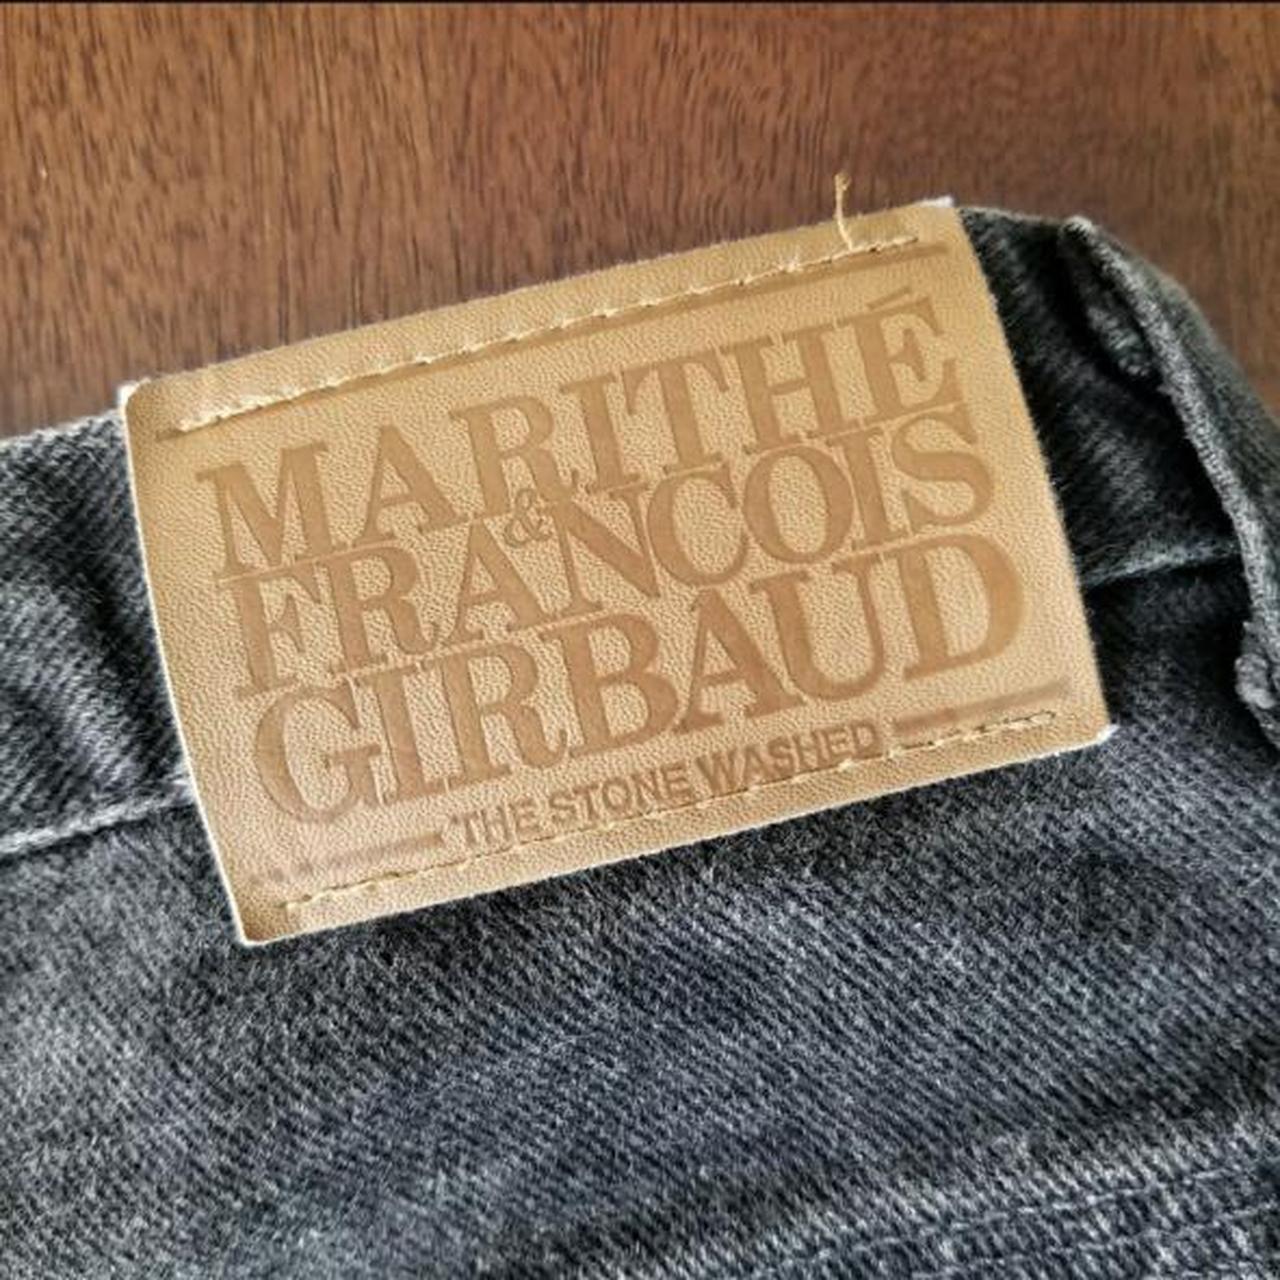 Product Image 1 - VTG MARITHE FRANCOIS GIRBAUD BLACK